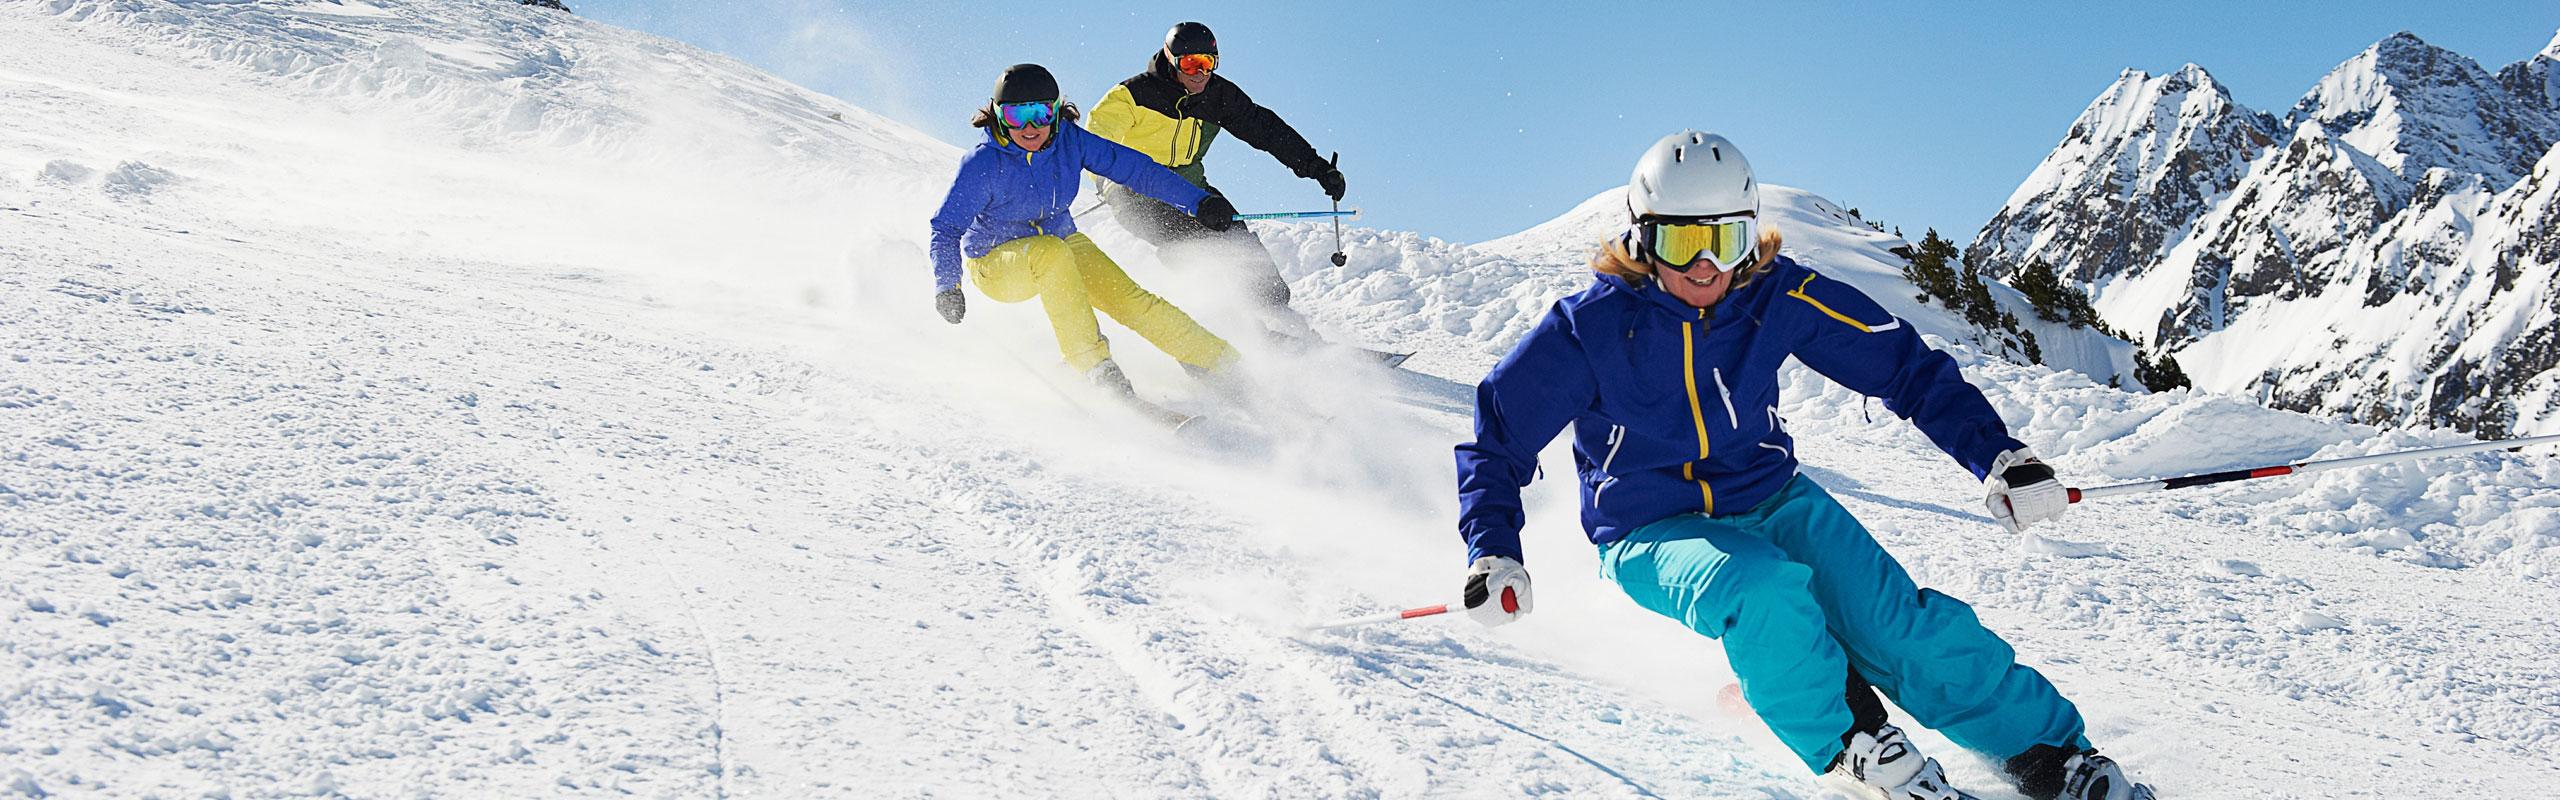 4-Day Harbin Ice Wonderland and Short Ski Tour (Without Hotel)